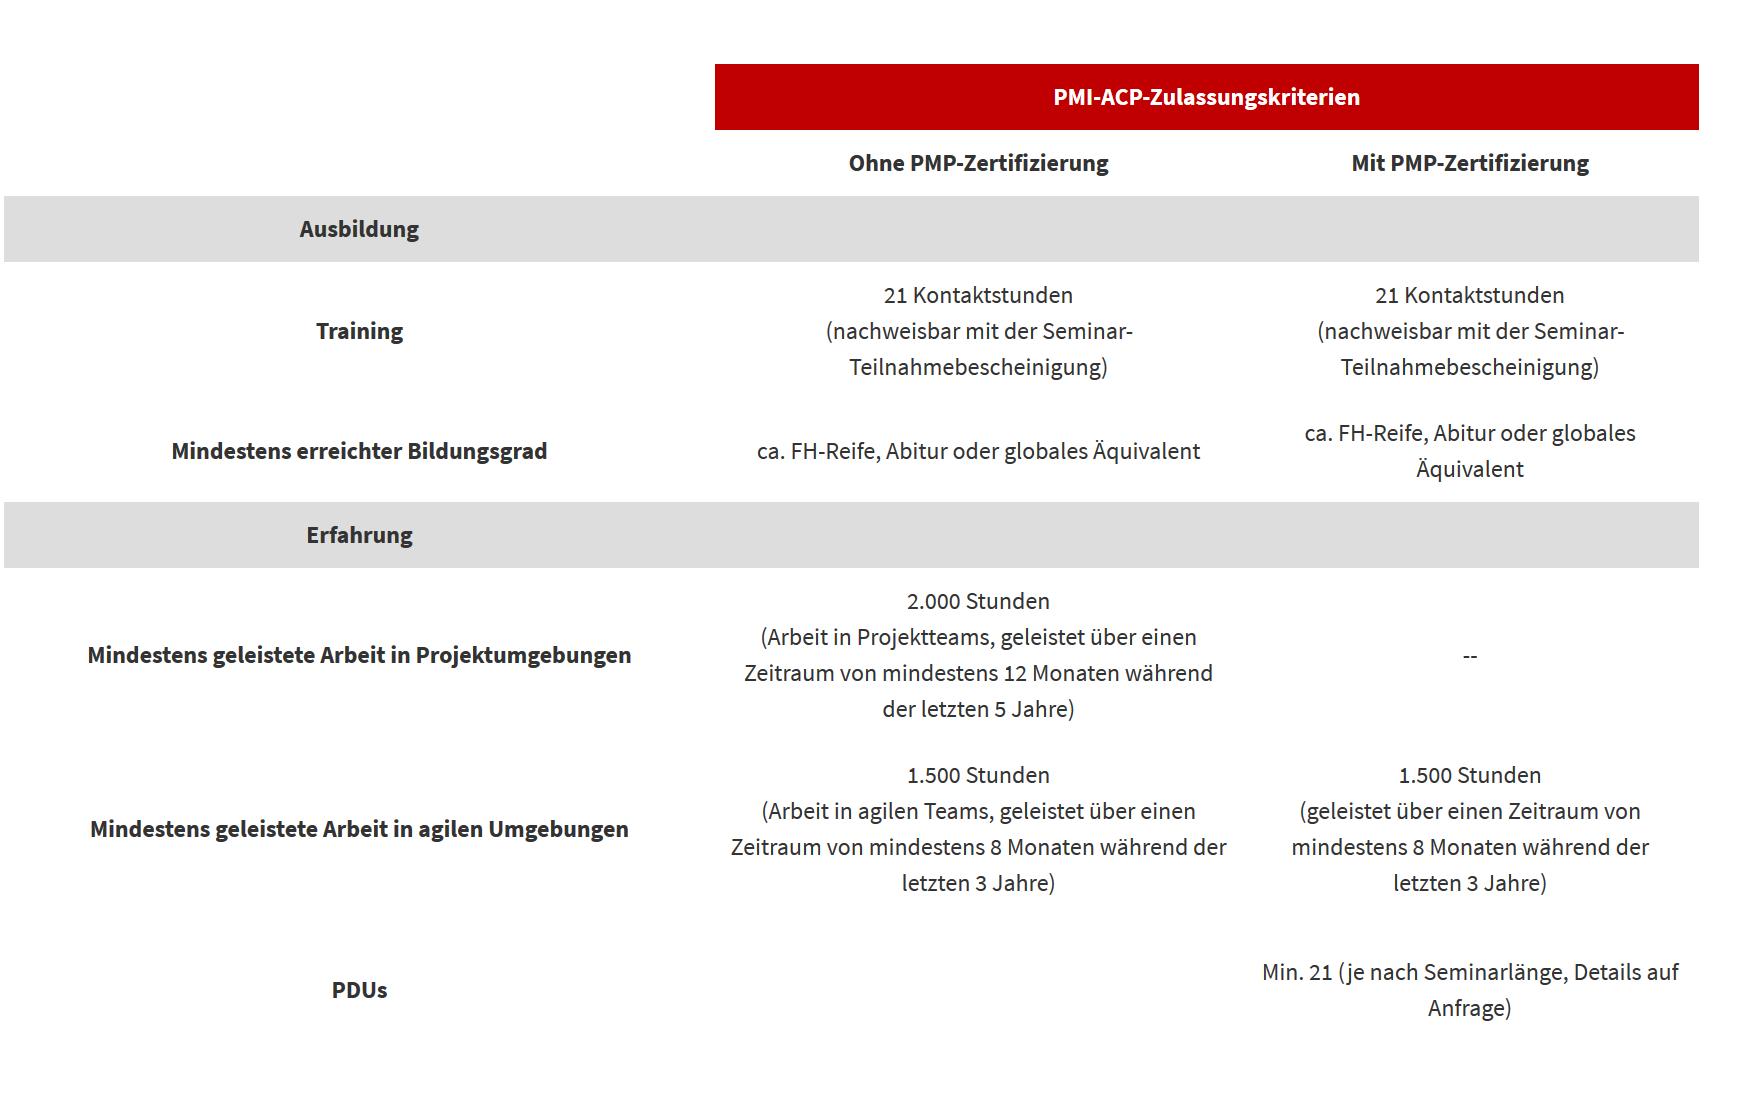 PMI Agile Certified Practitioner Zulassungskriterien